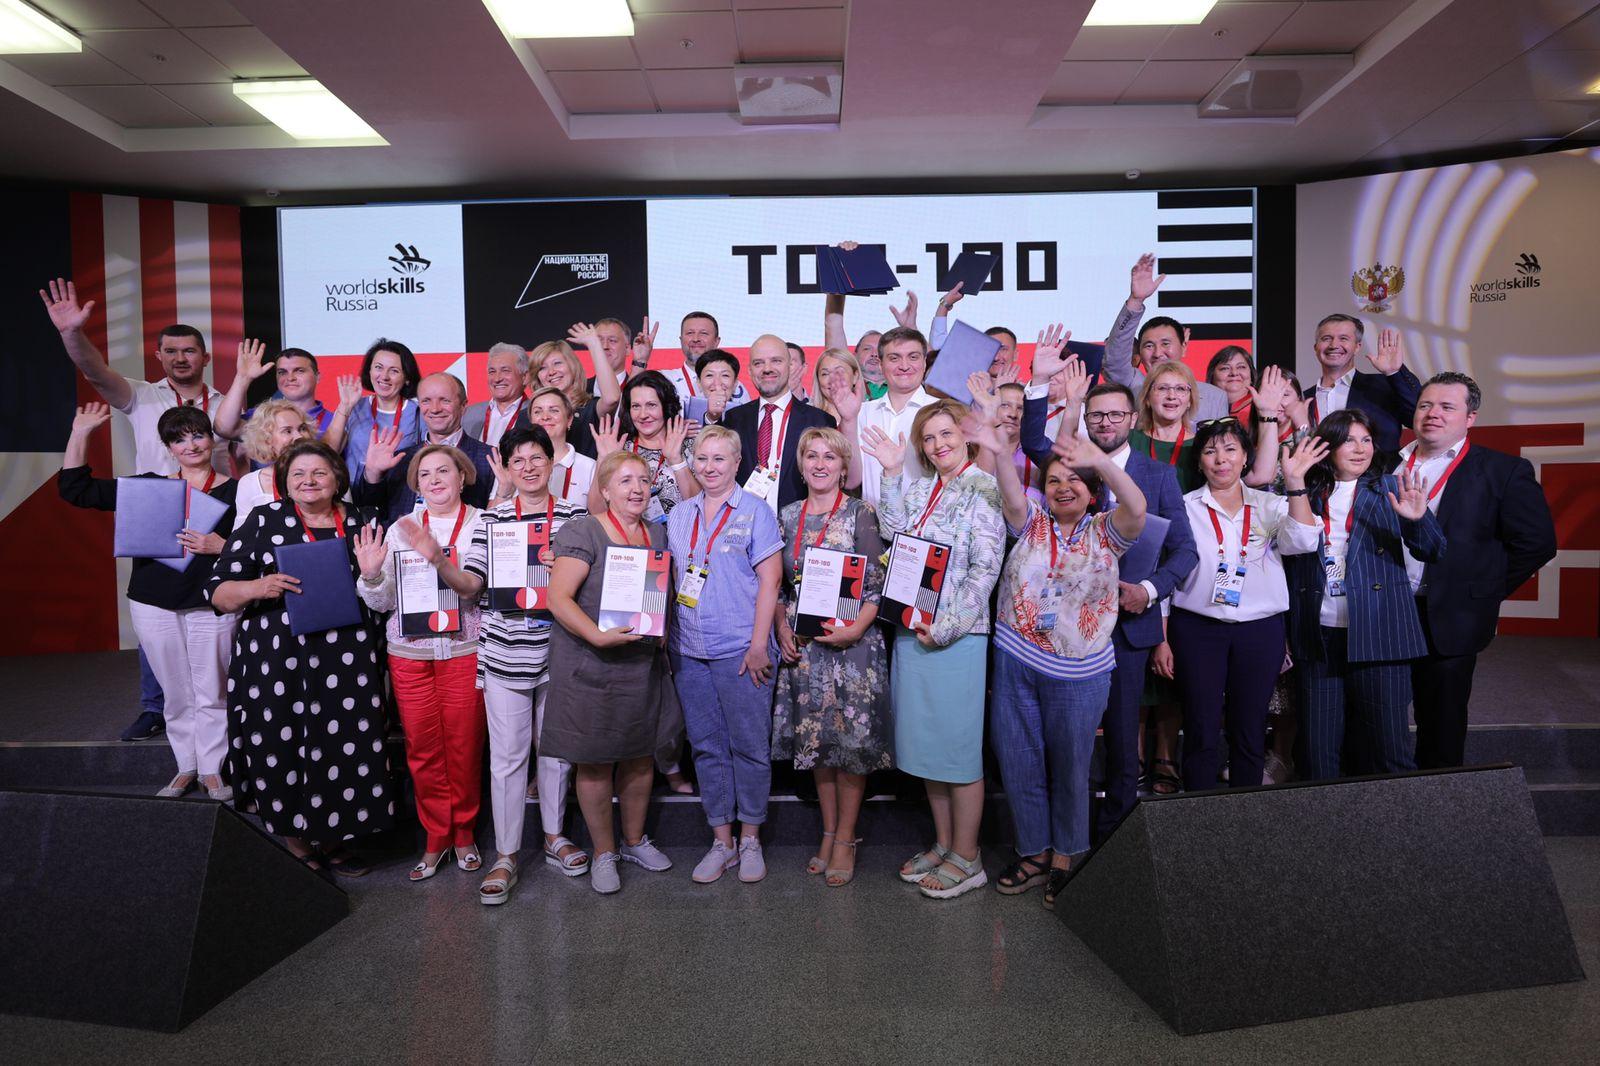 6 колледжей и техникумов Чувашии вошли в ТОП-100 Worldskills Russia